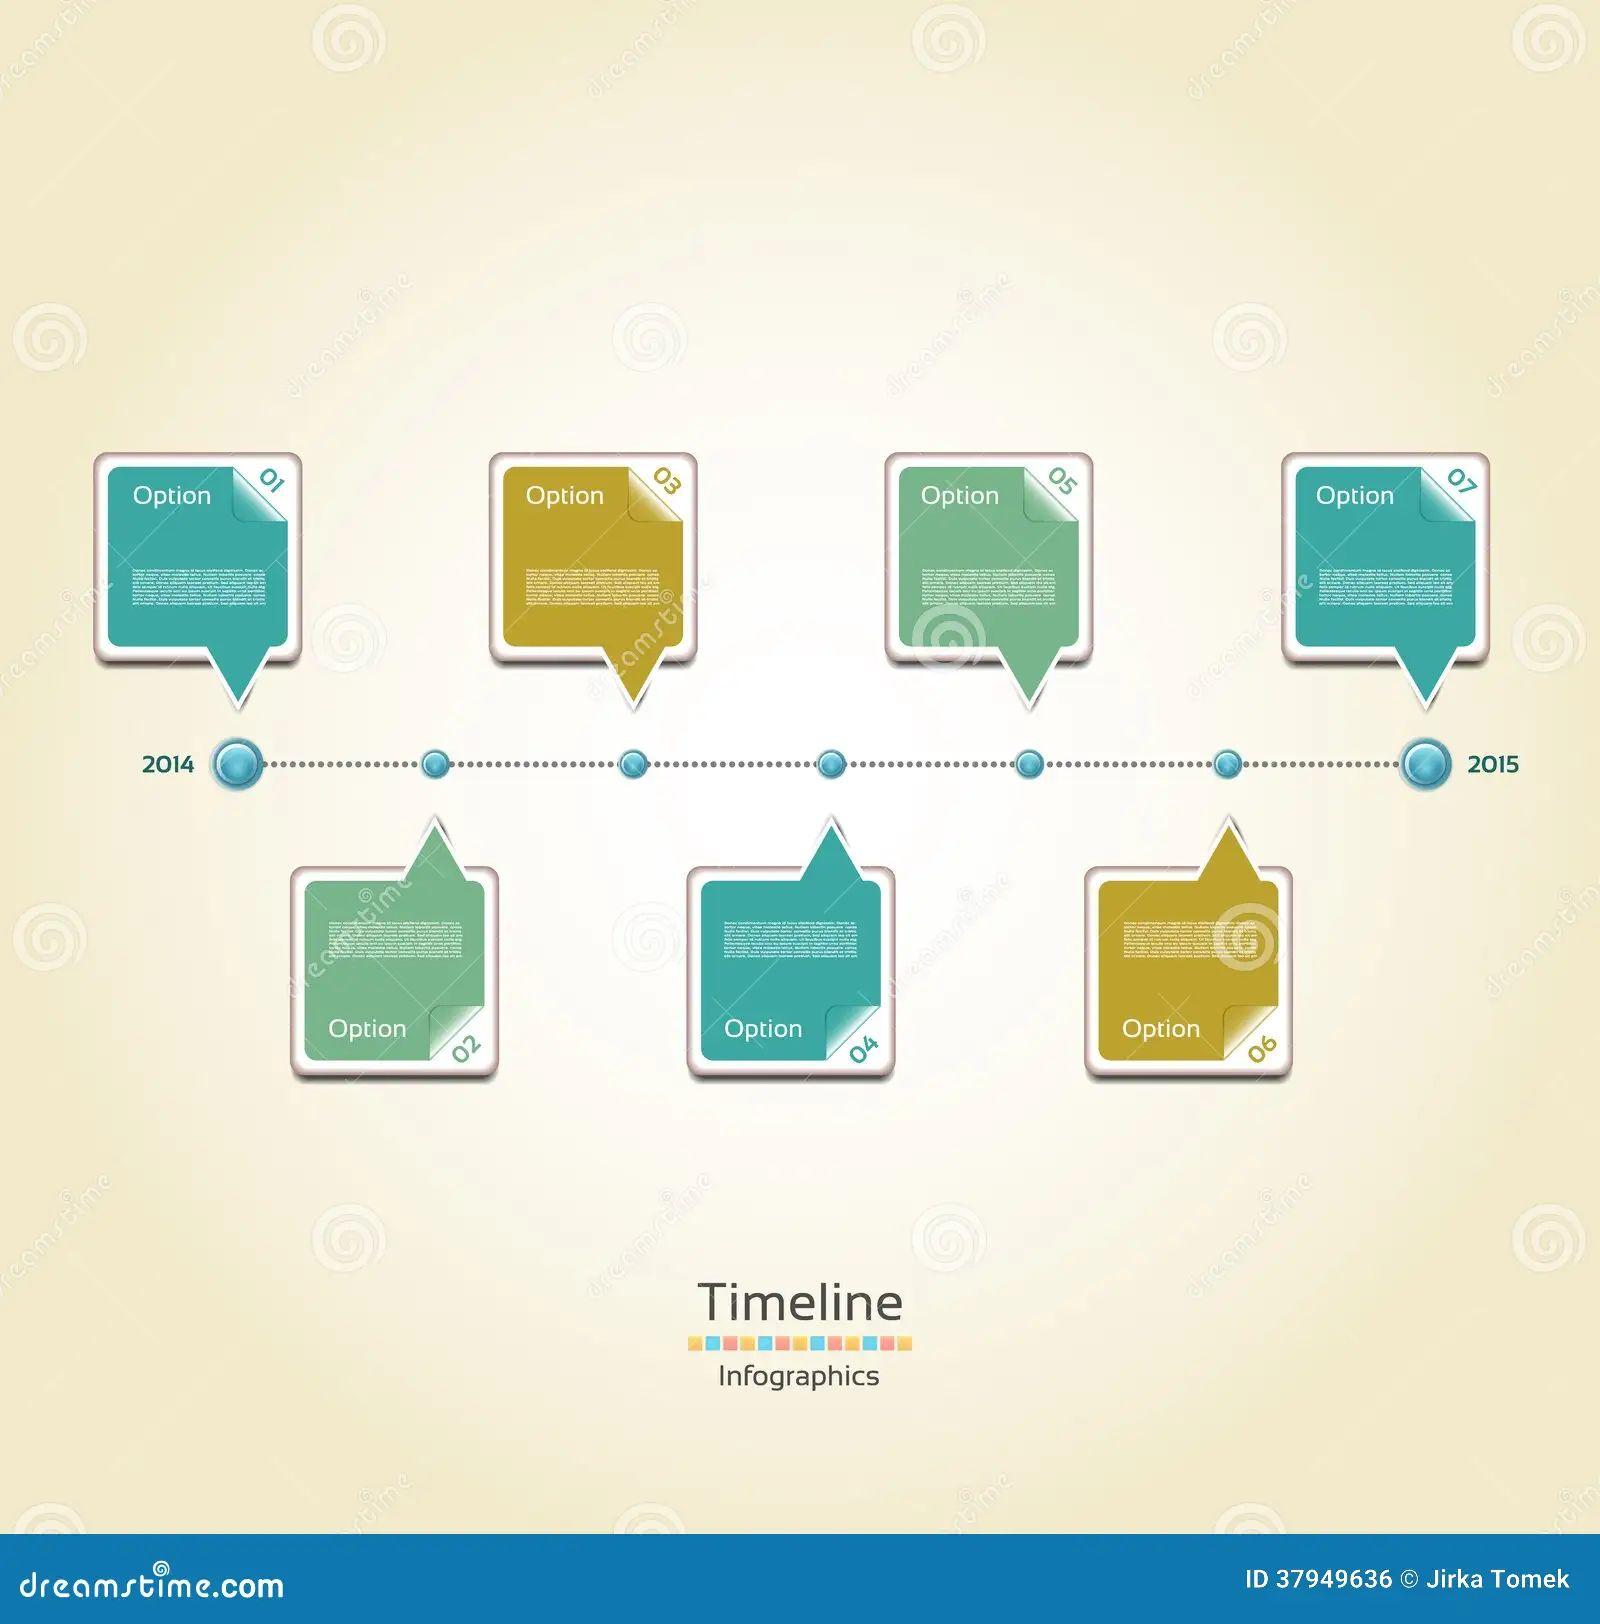 web design timeline template